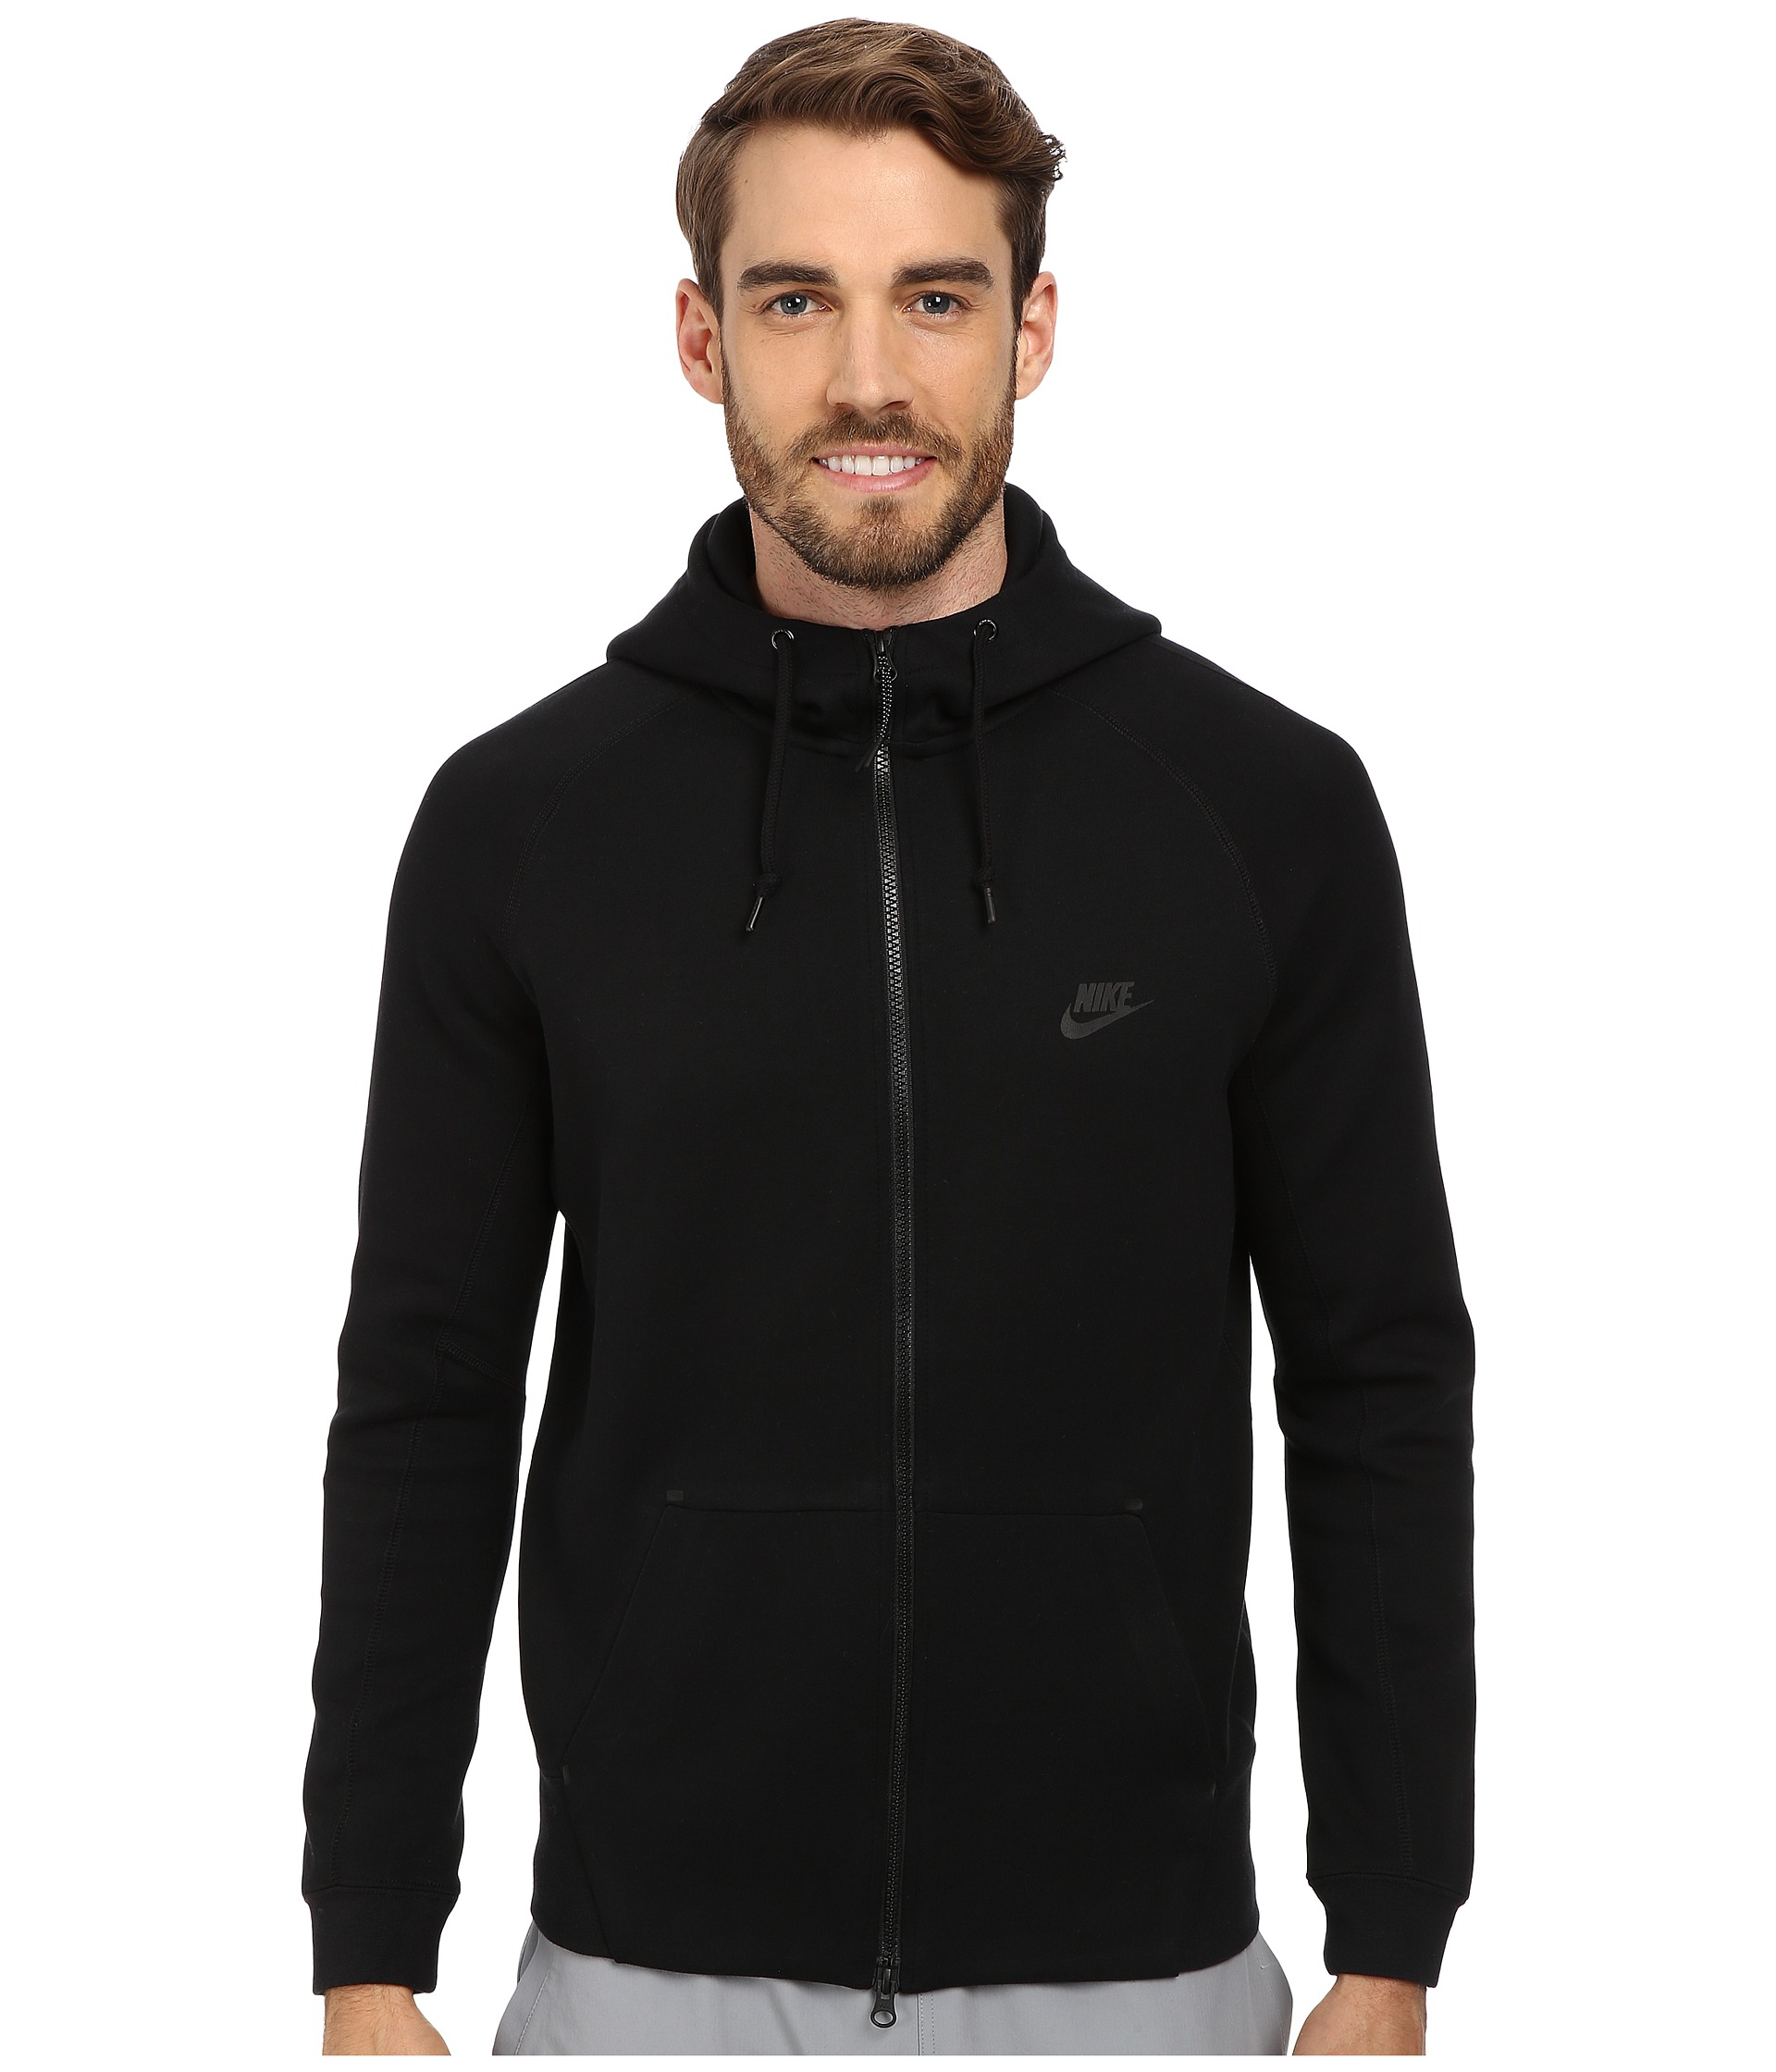 Nike Advantage 15 Full-zip Fleece Hoodie in Black for Men - Save ...